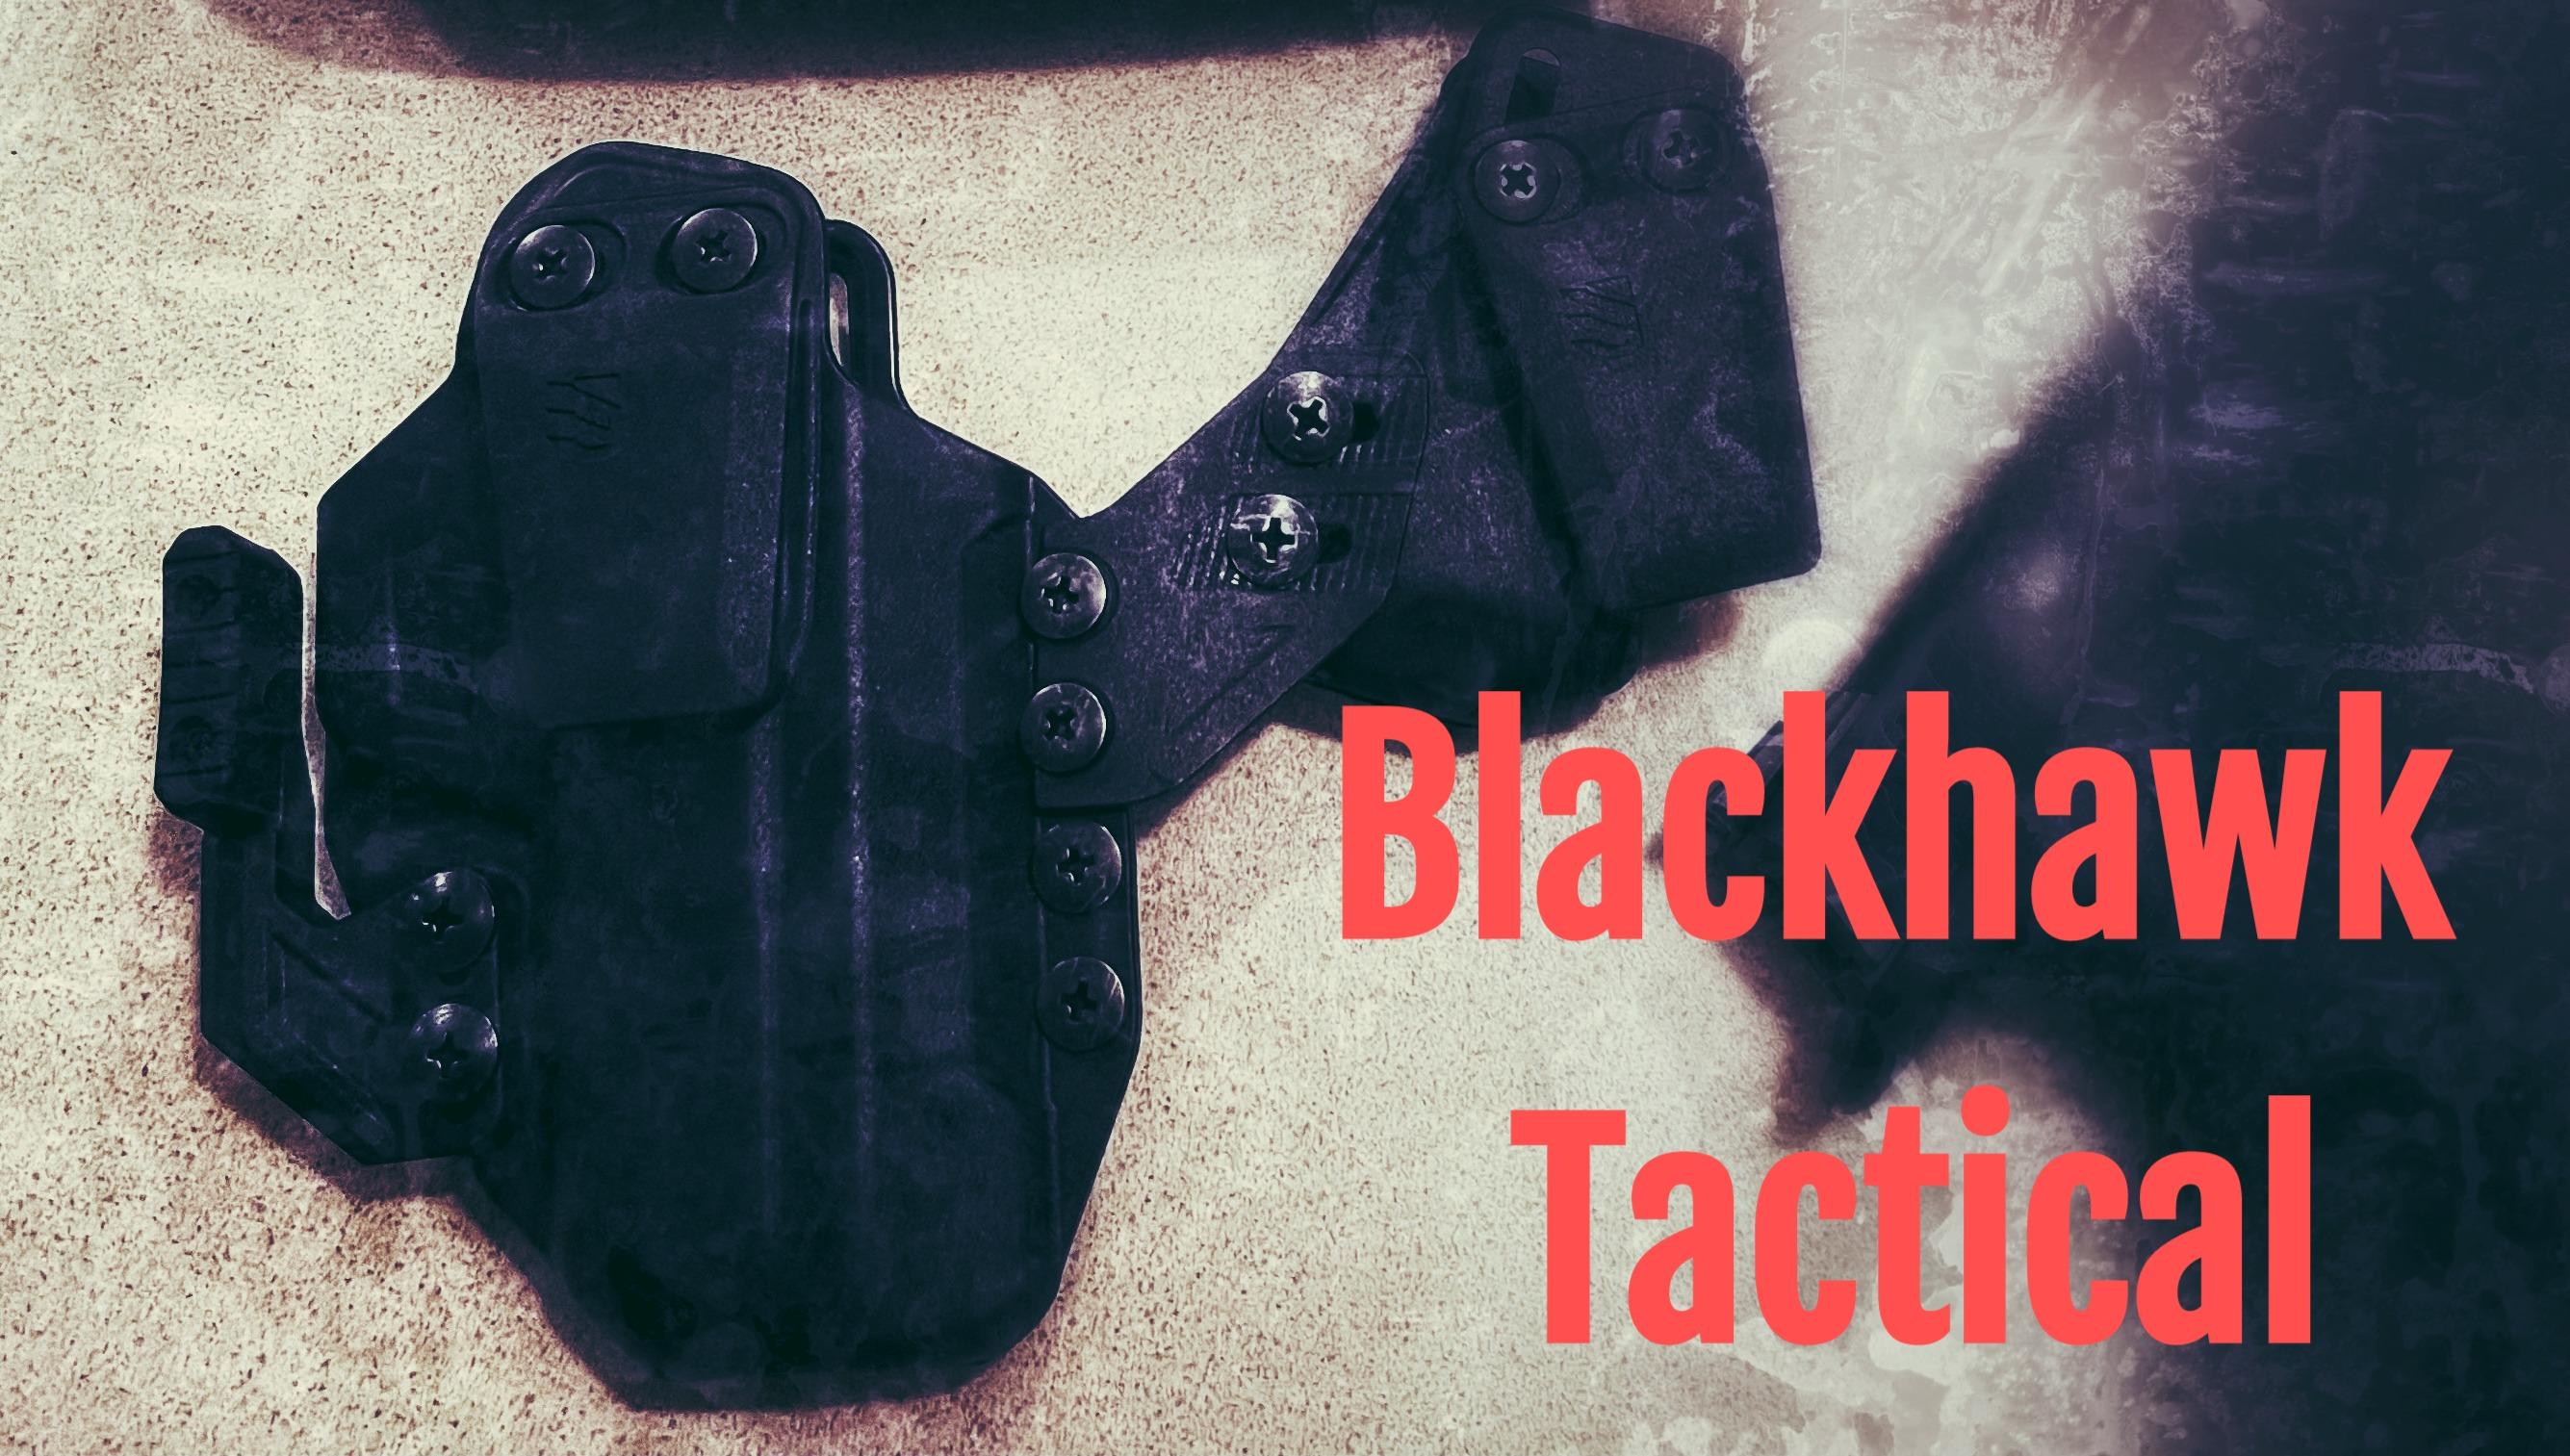 BlackhawkTactical